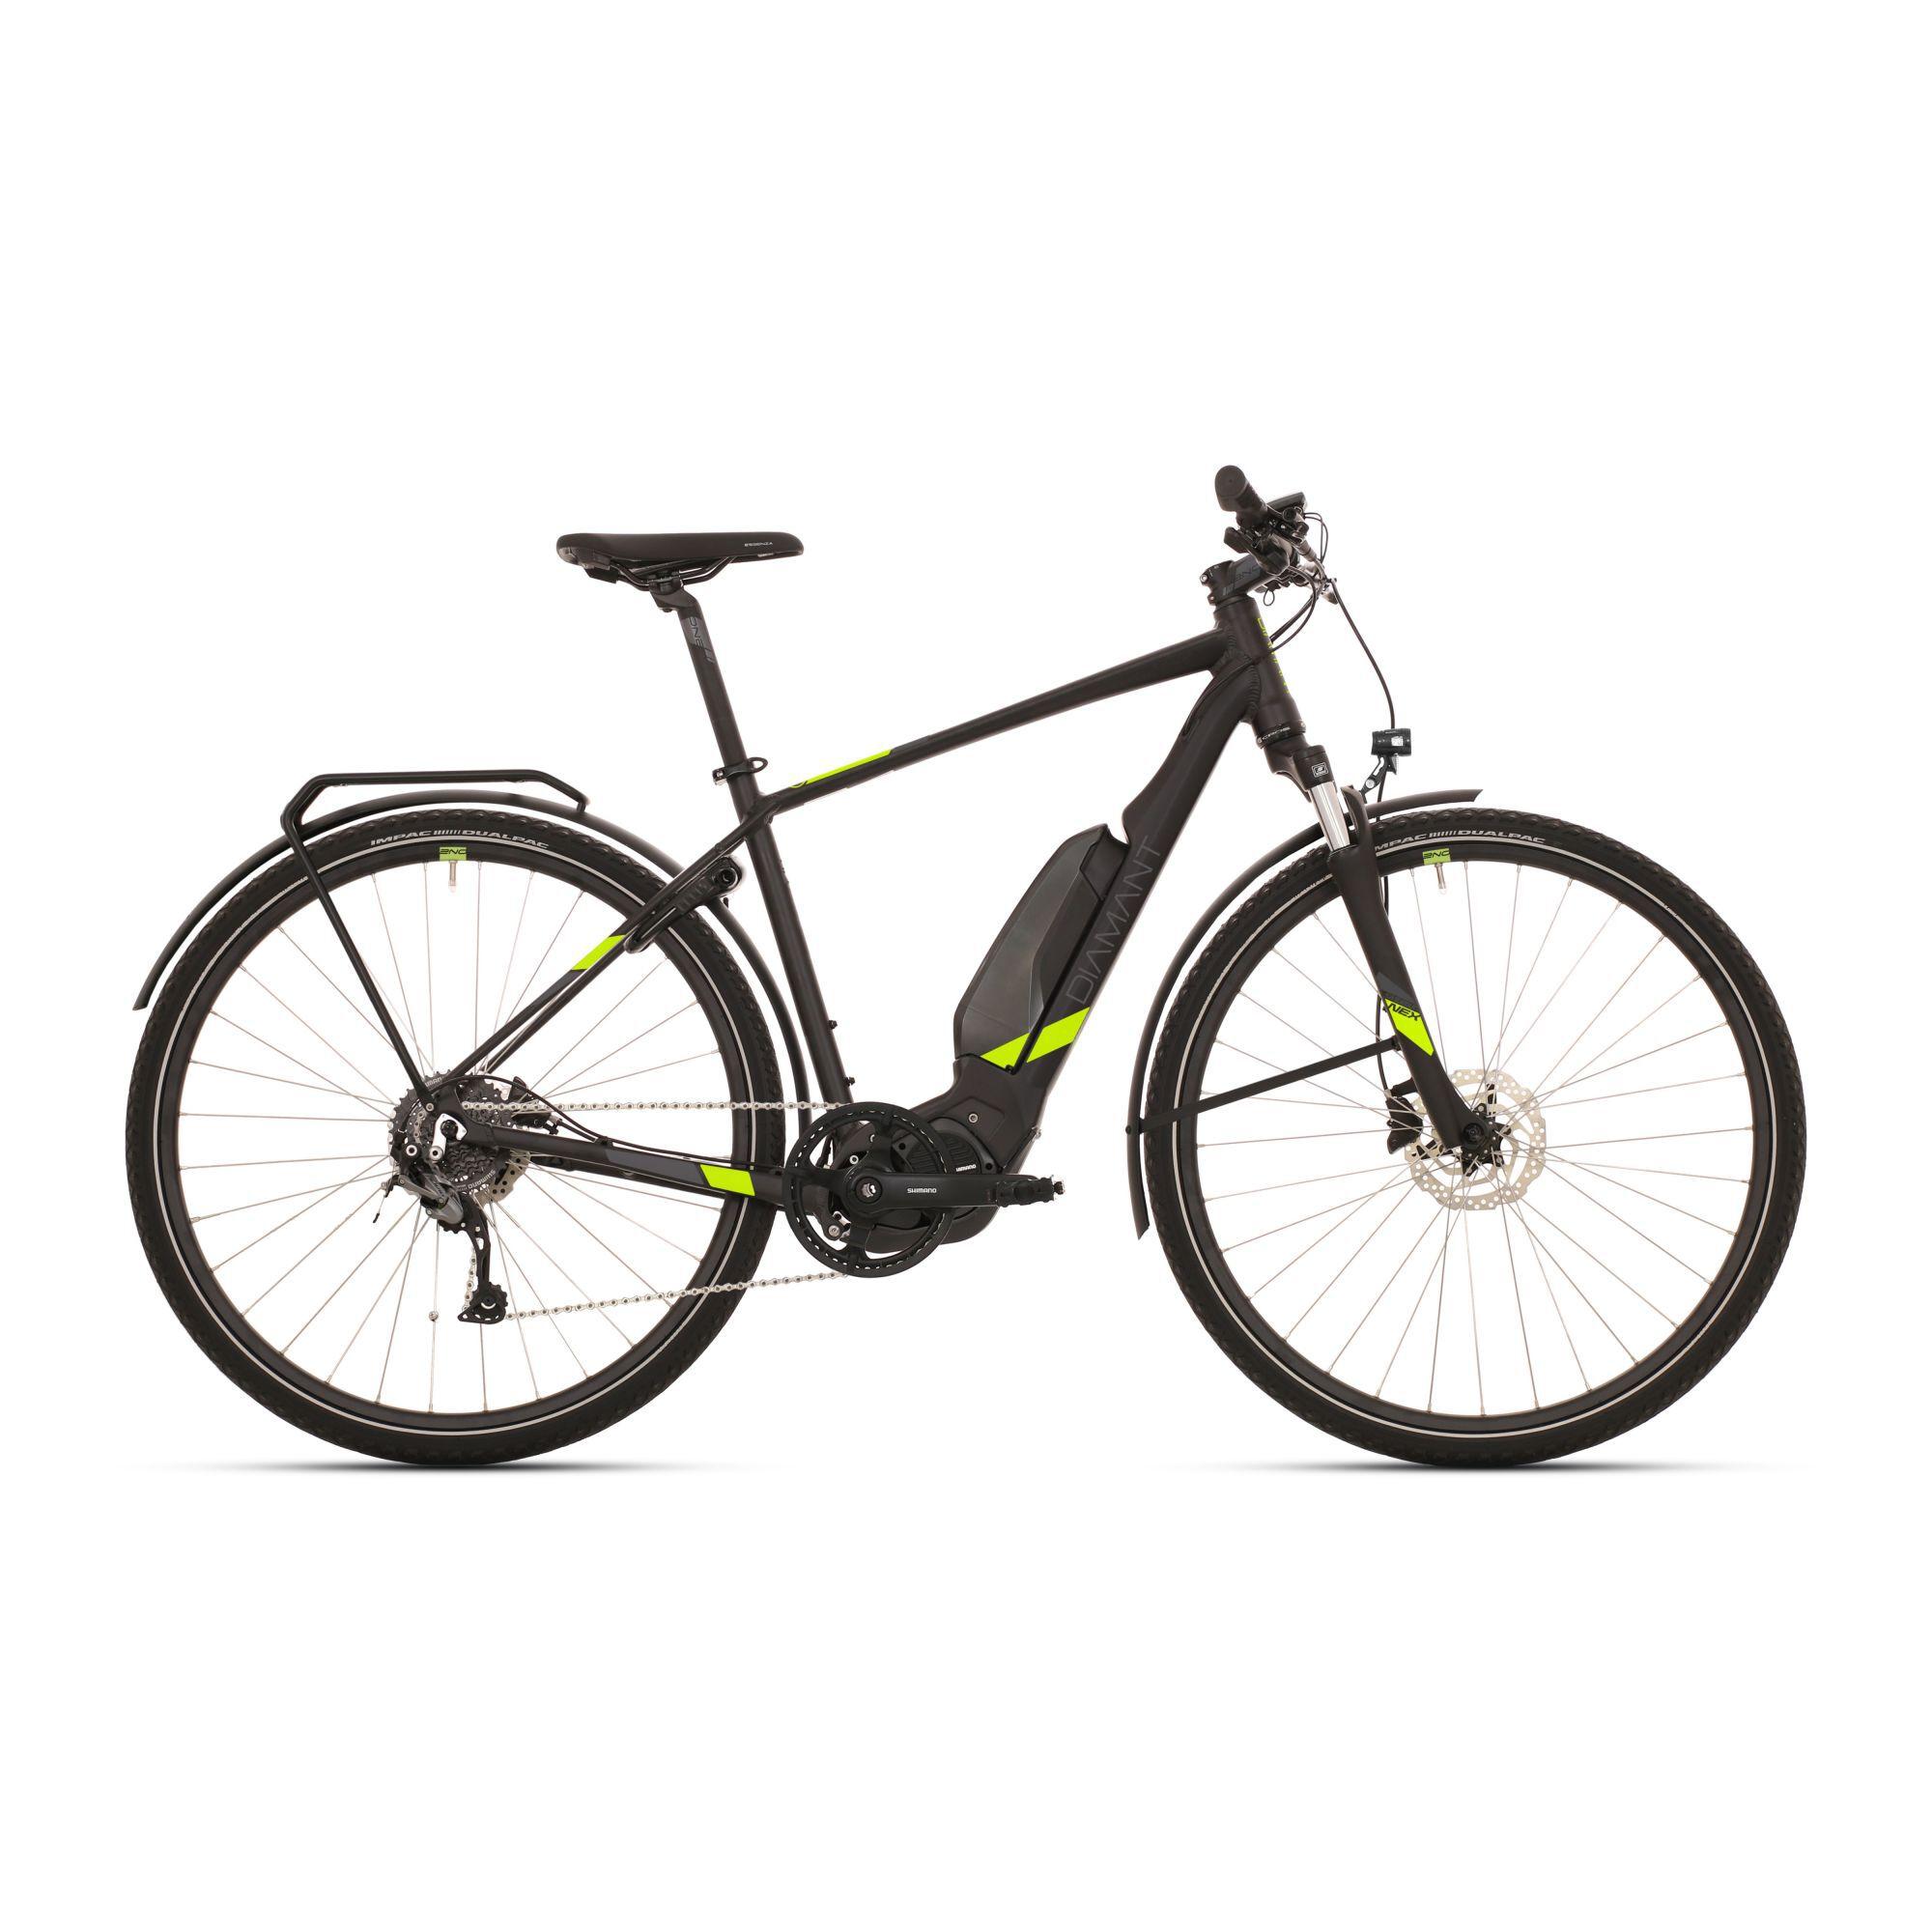 Diamant | Volt Classic el sykkel | Sykkel | Svart